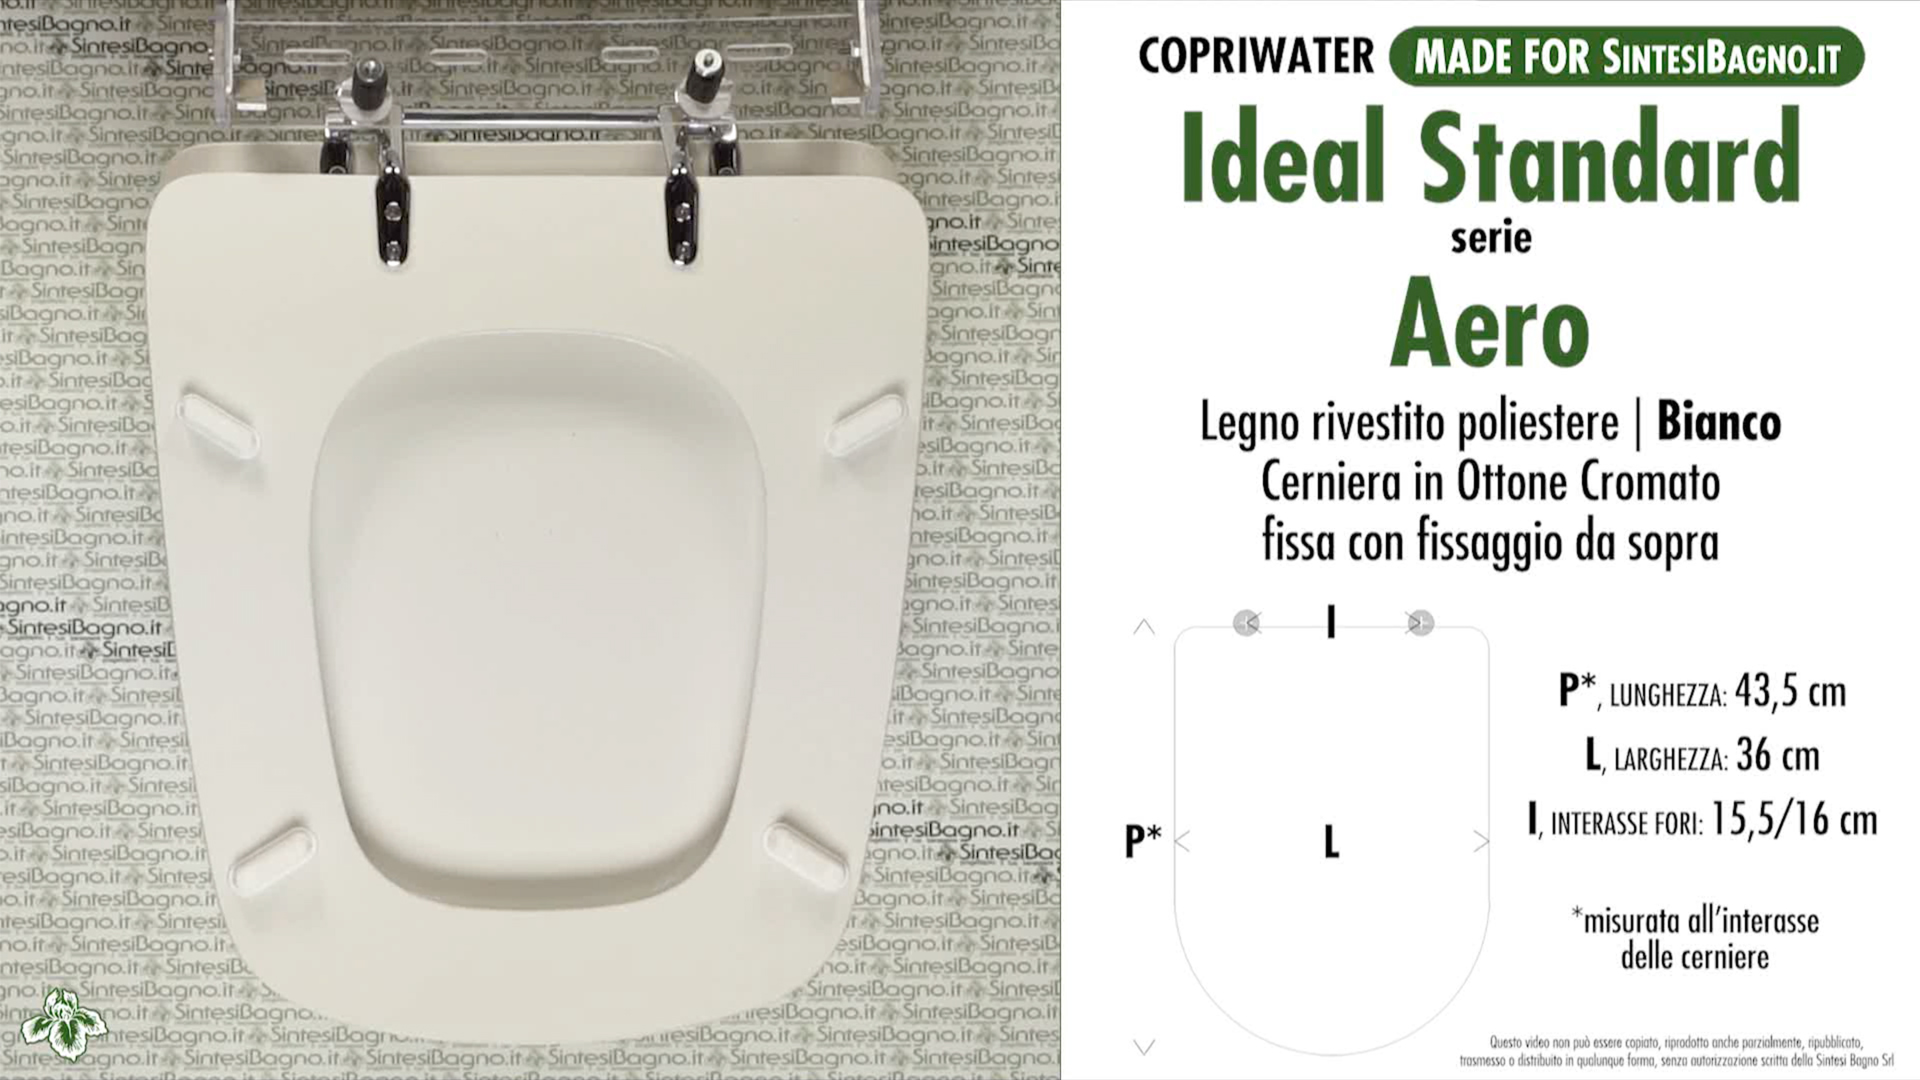 schede tecniche misure copriwater ideal standard serie aero